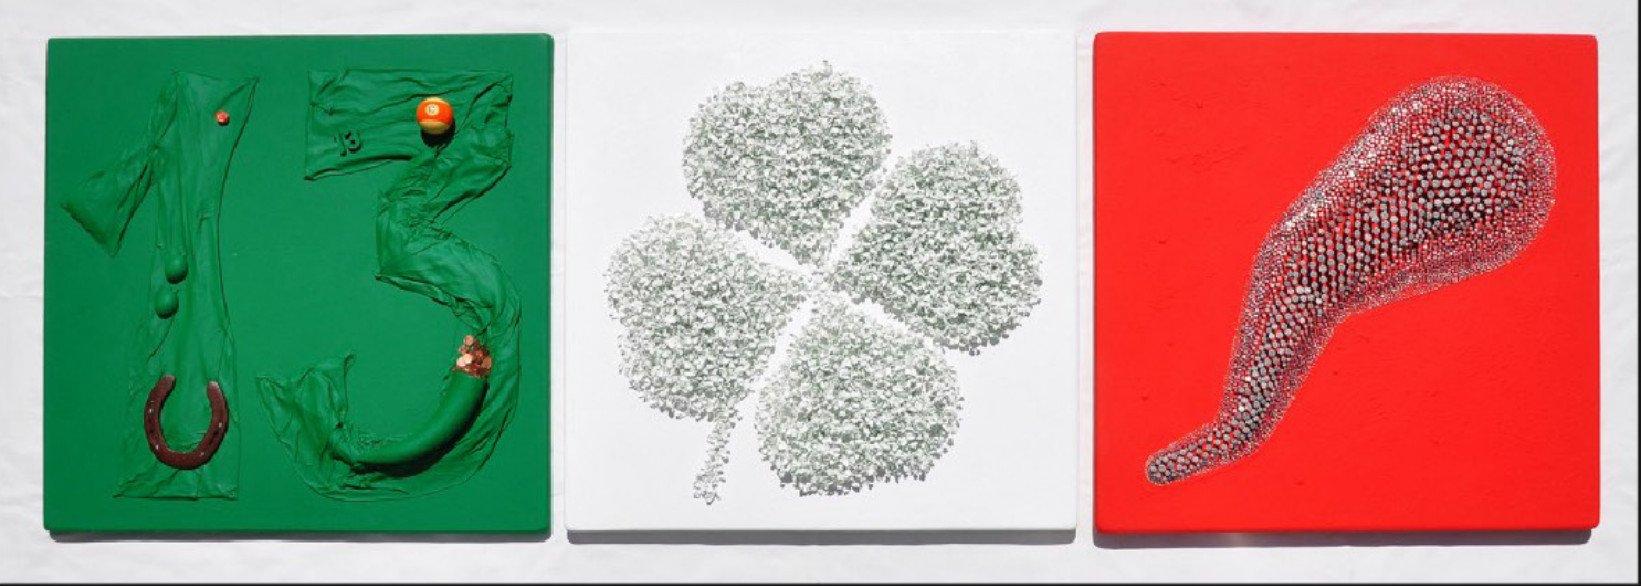 italians_are_not_2